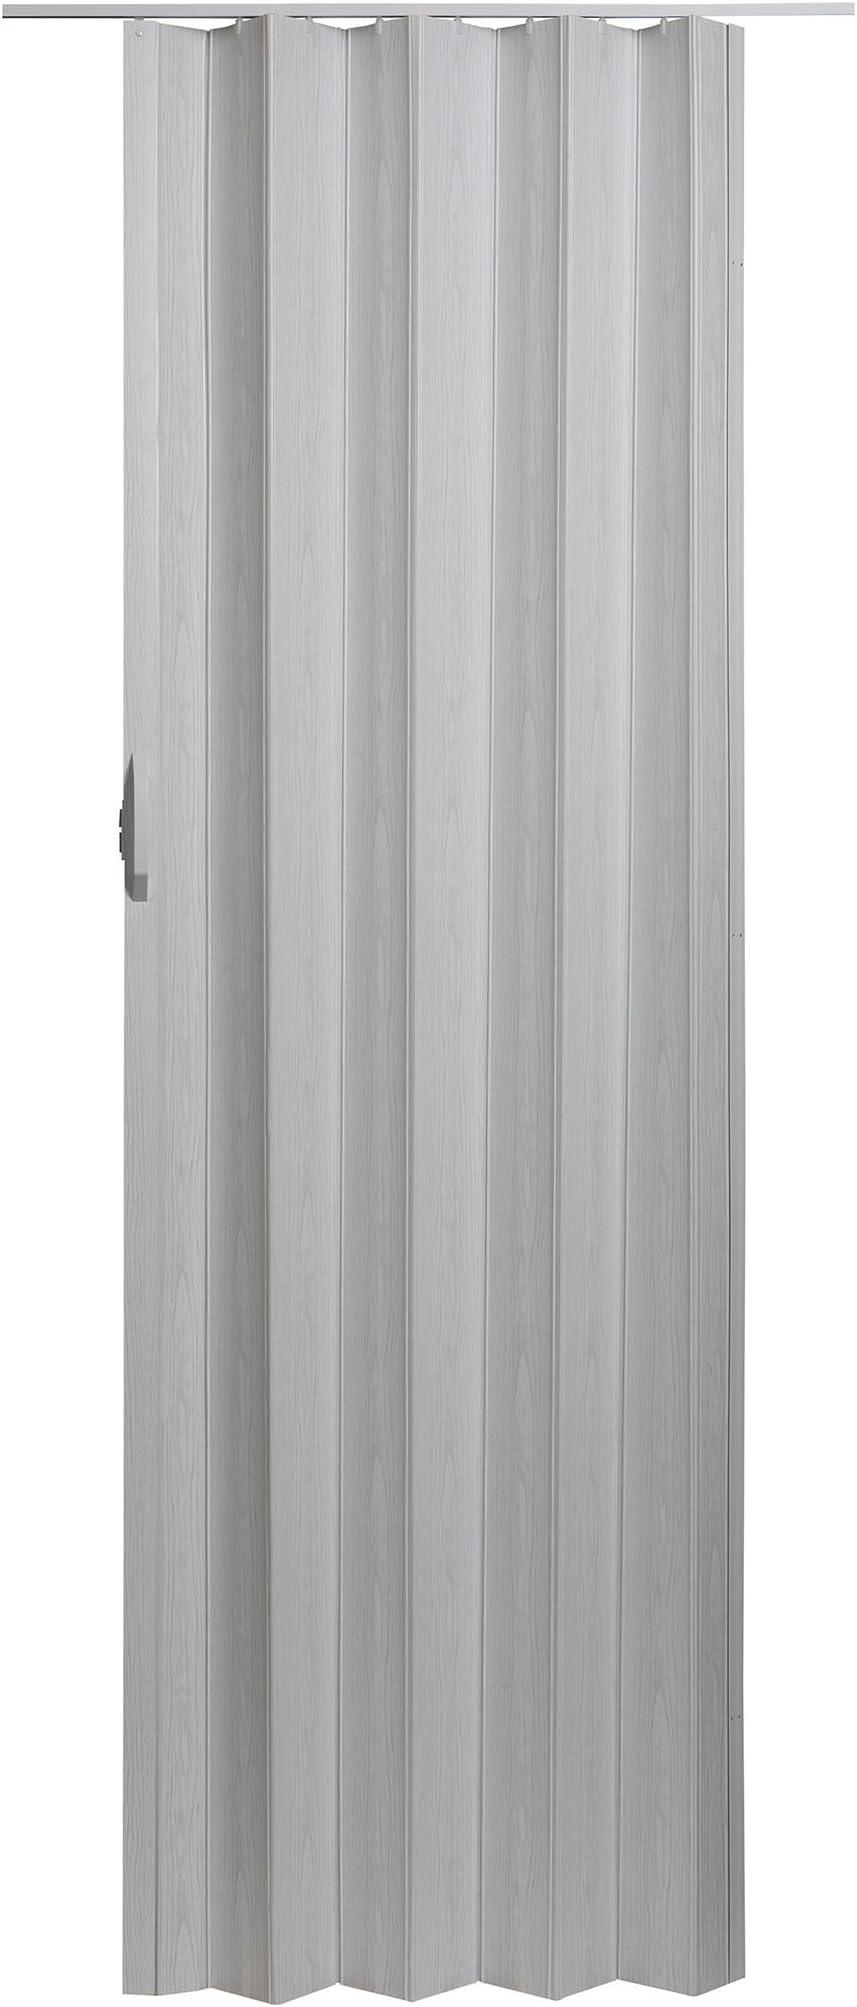 Spectrum VS3280M Via 24  to 36  x 80  Accordion Folding Door White  sc 1 st  Amazon.com & Multifold Interior Doors | Amazon.com | Building Supplies - Interior ...